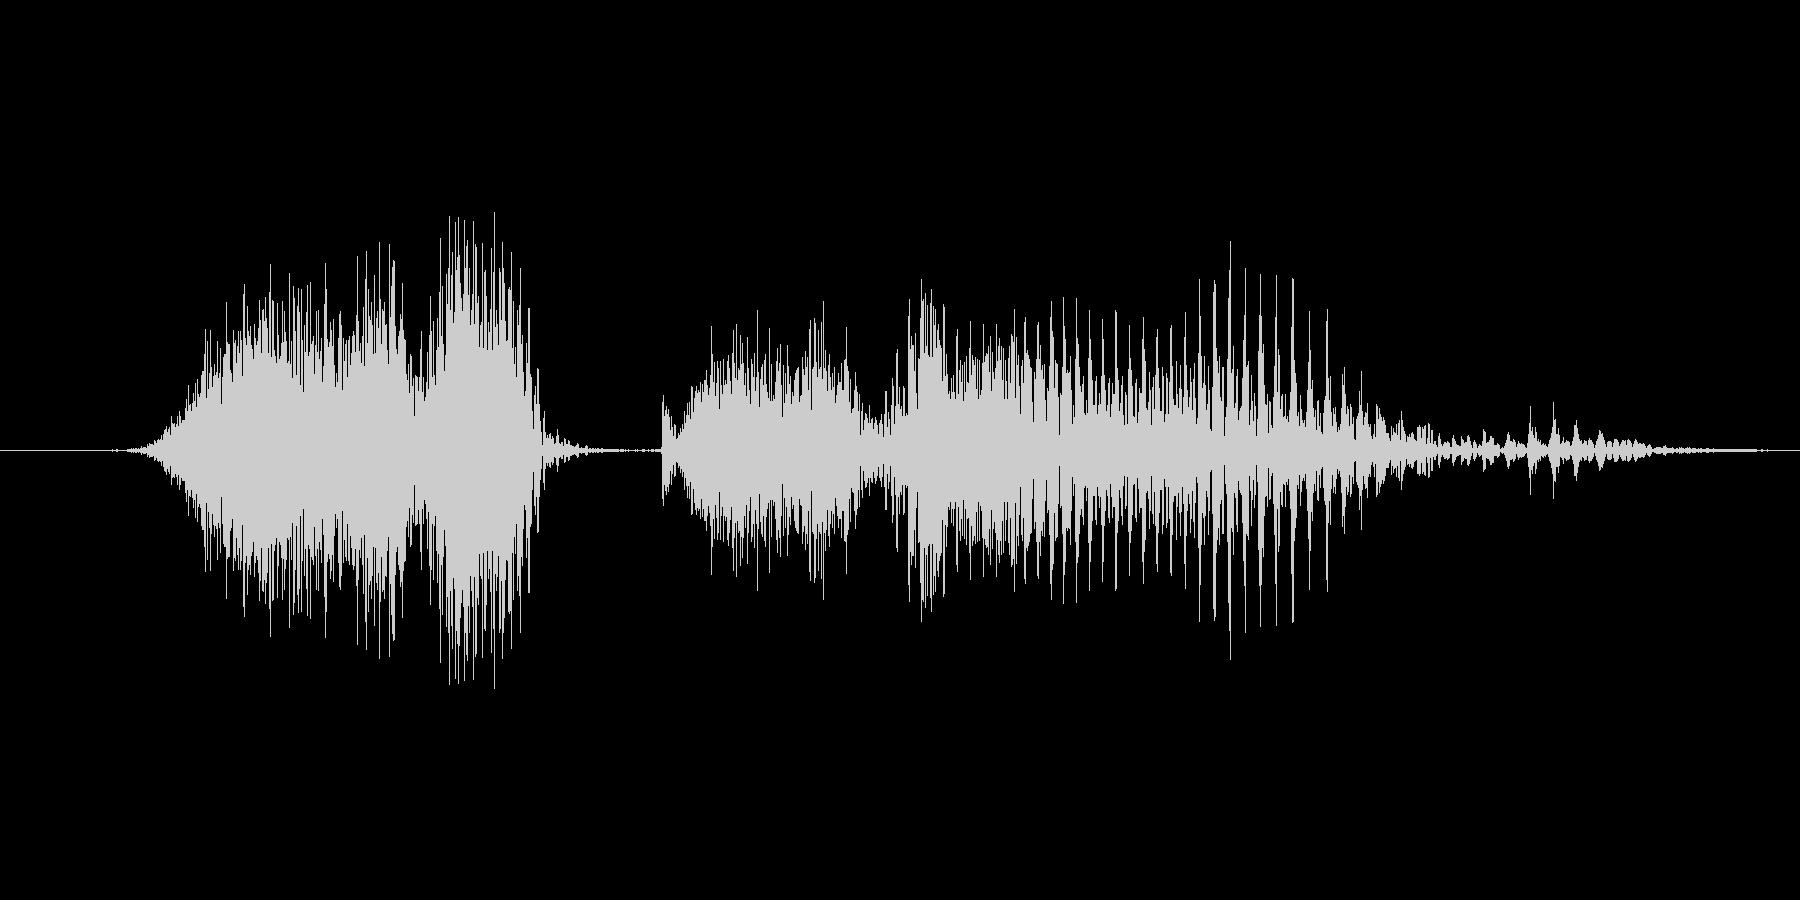 「6 AM」英語発音の未再生の波形